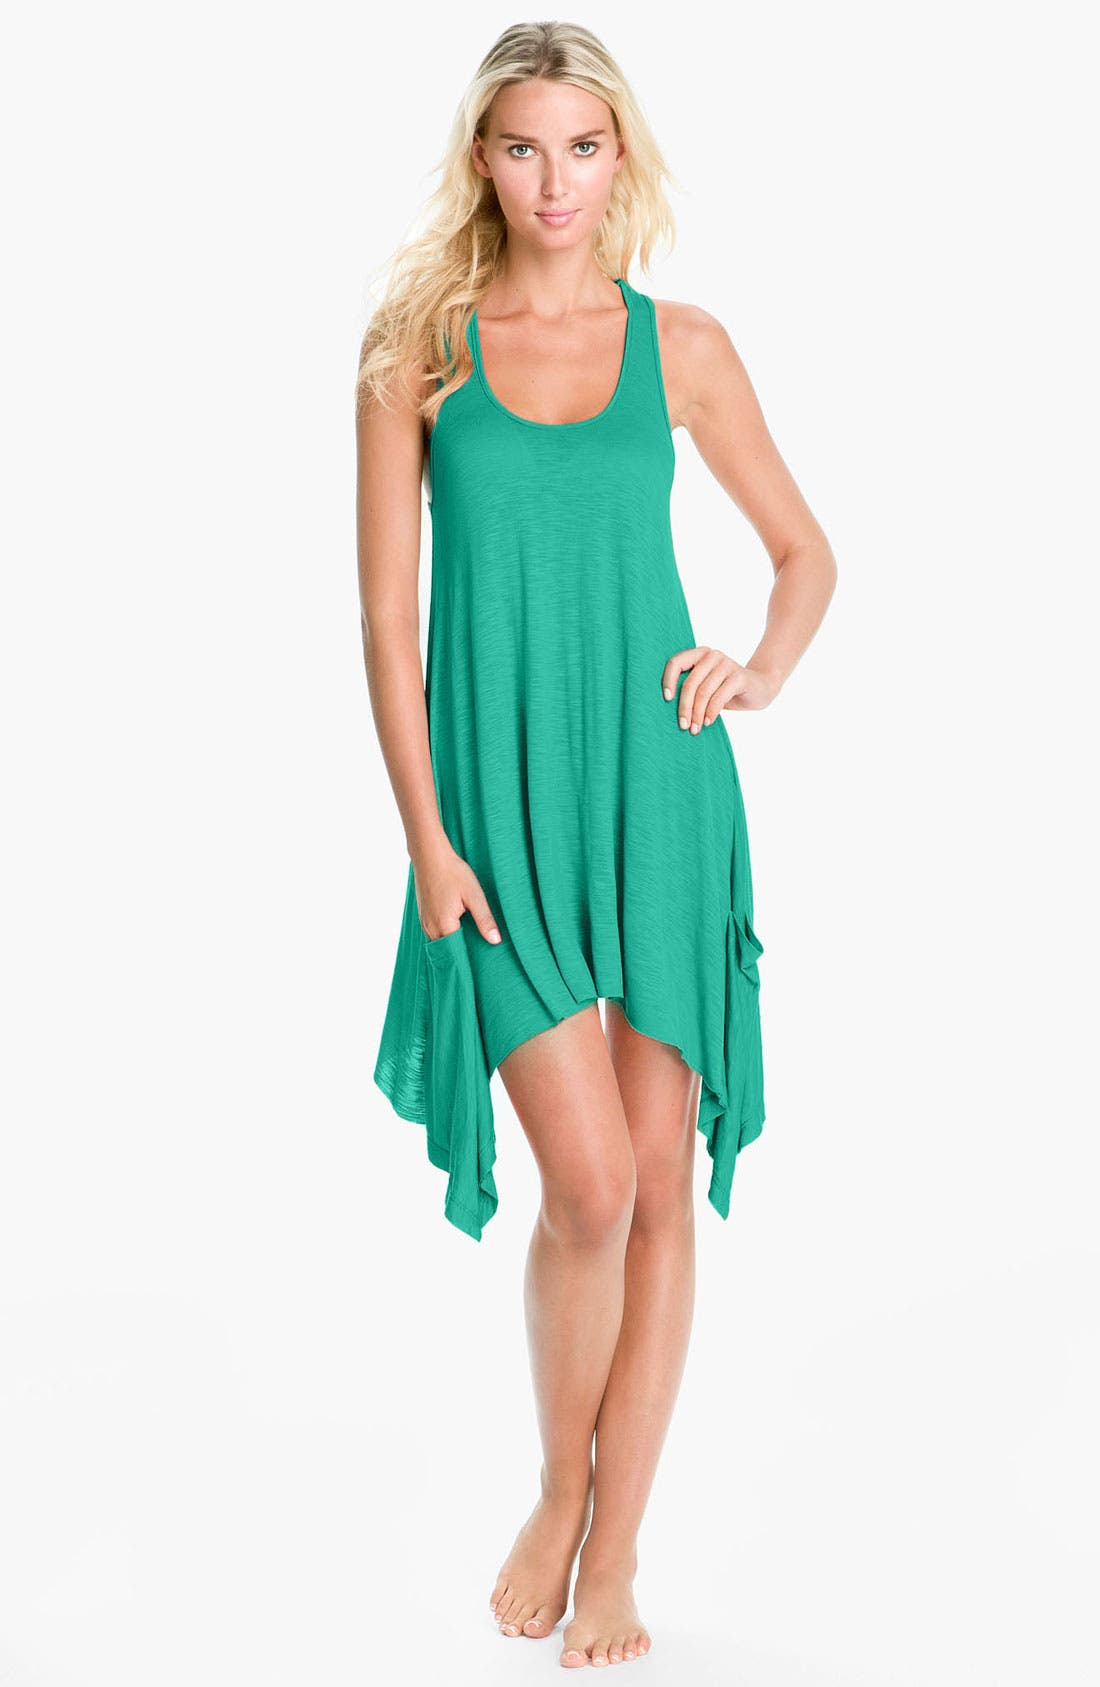 Alternate Image 1 Selected - Elan 'Handkerchief' Cover-Up Dress